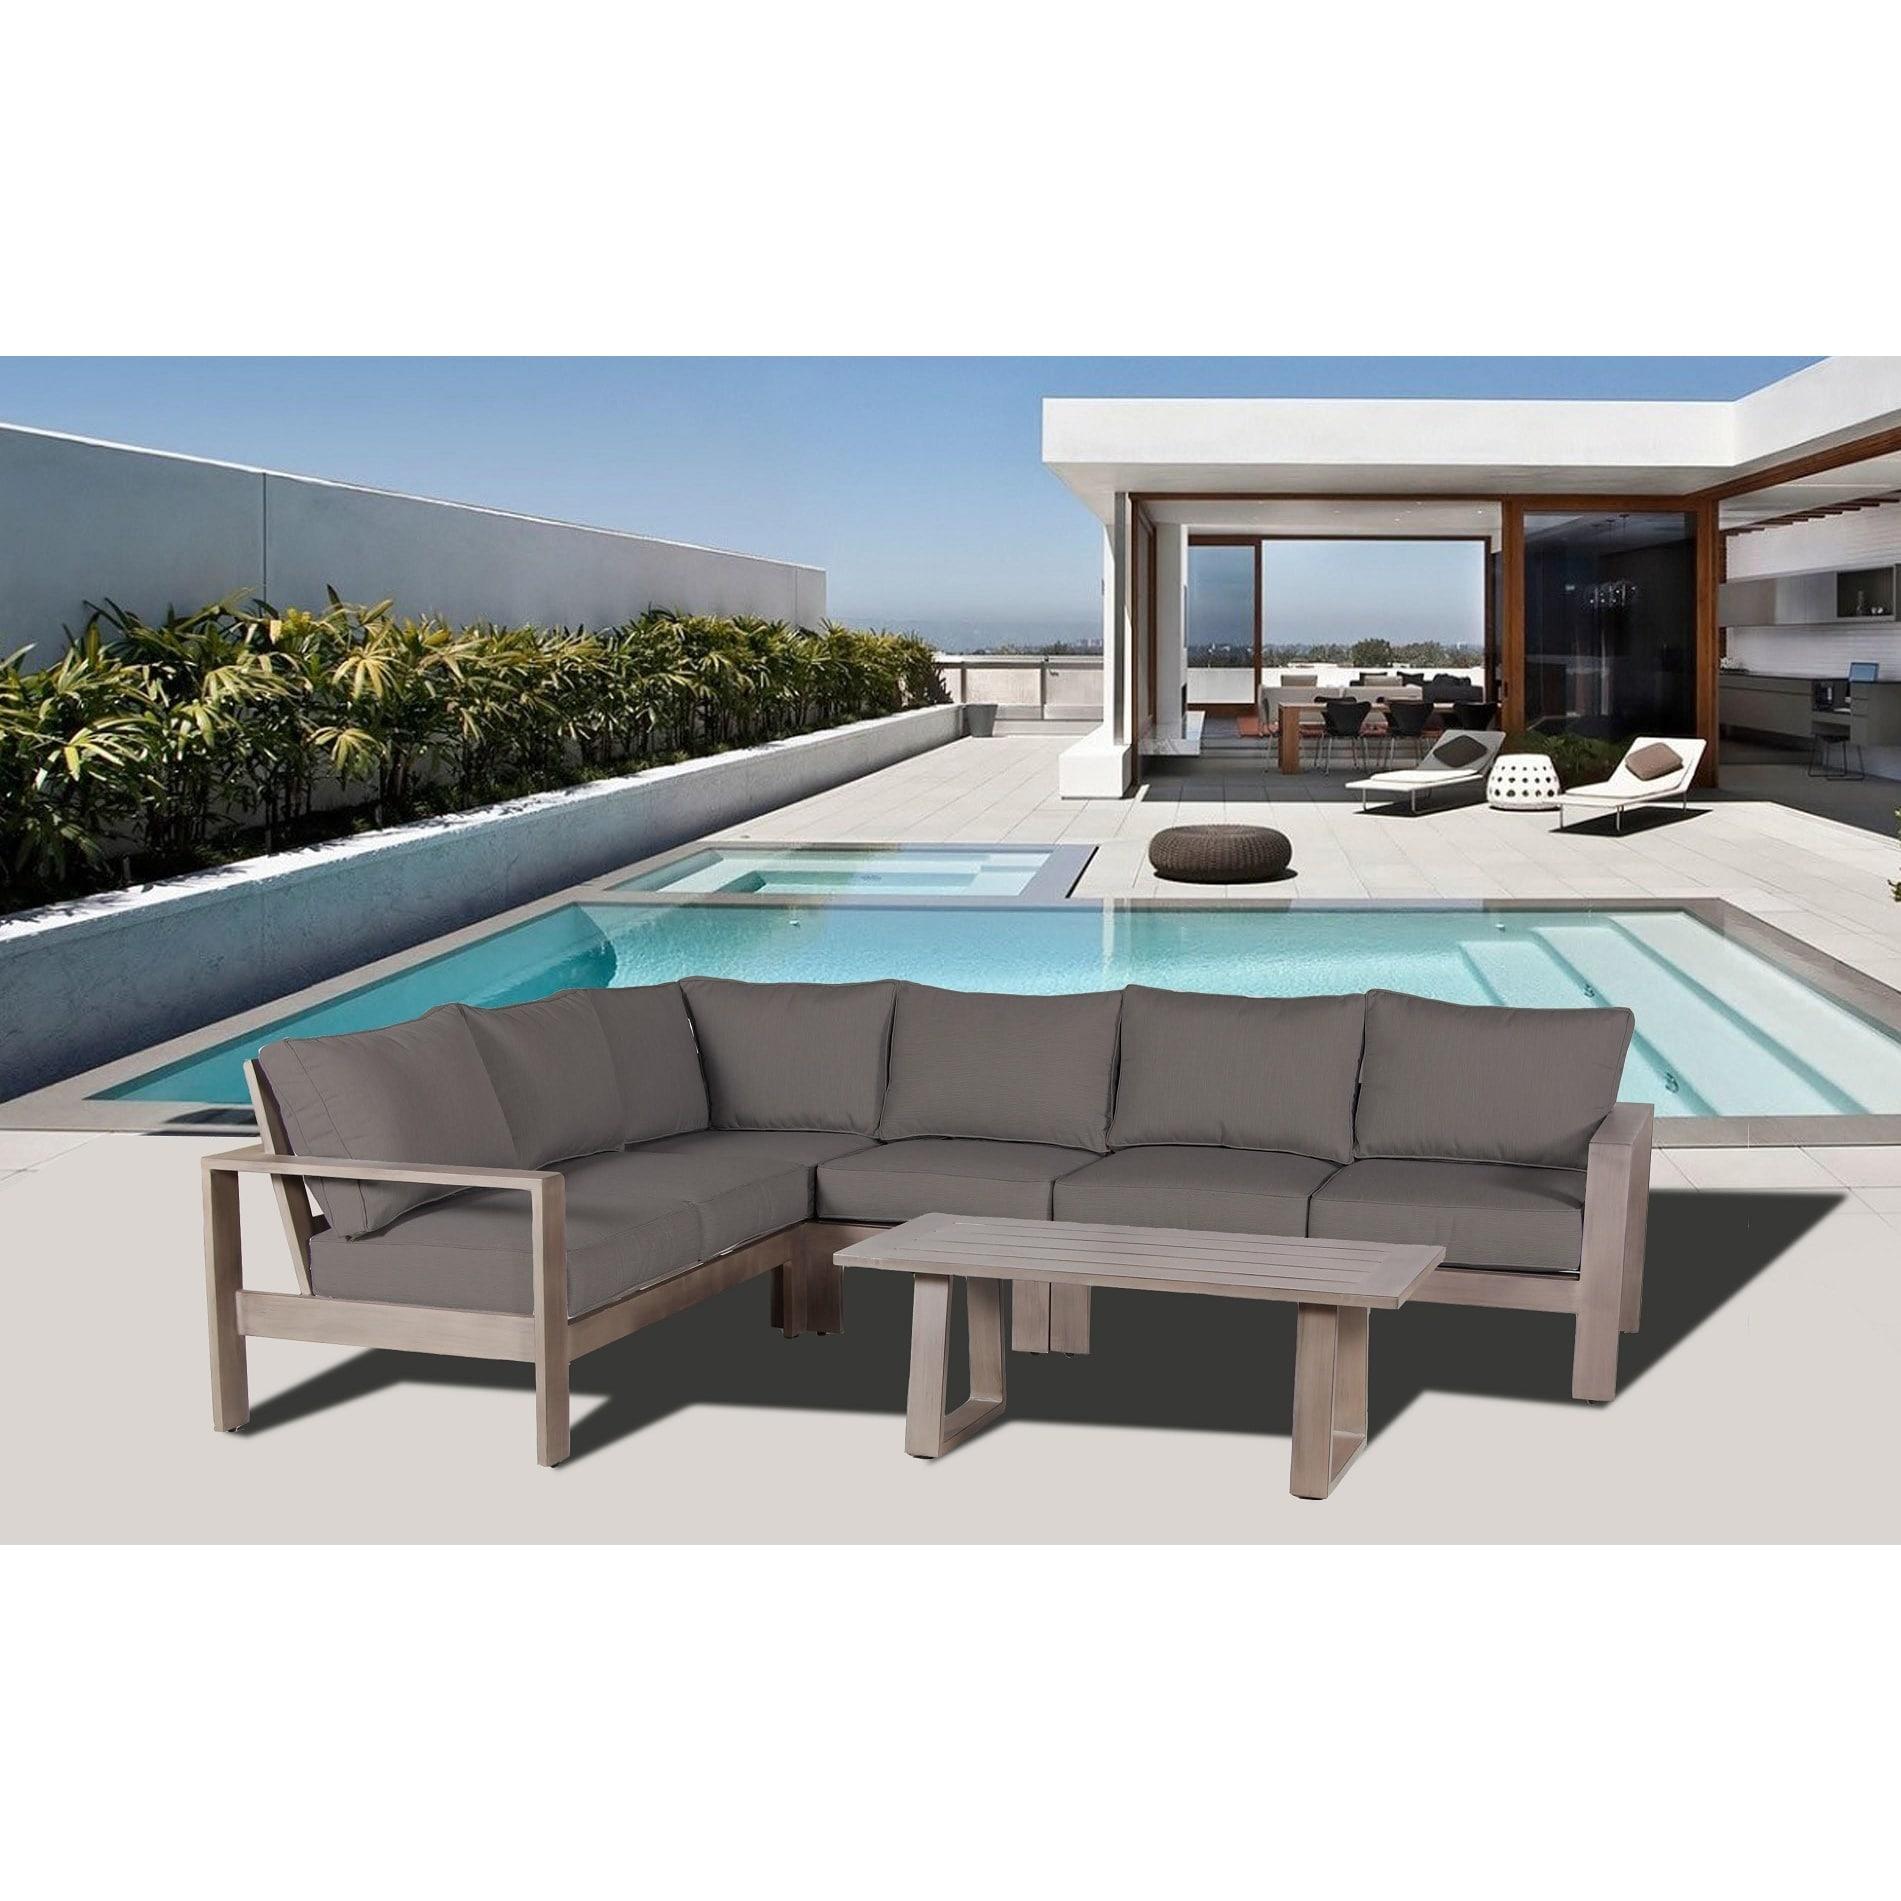 Aruba aluminum sectional set with canvas sunbrella cushions